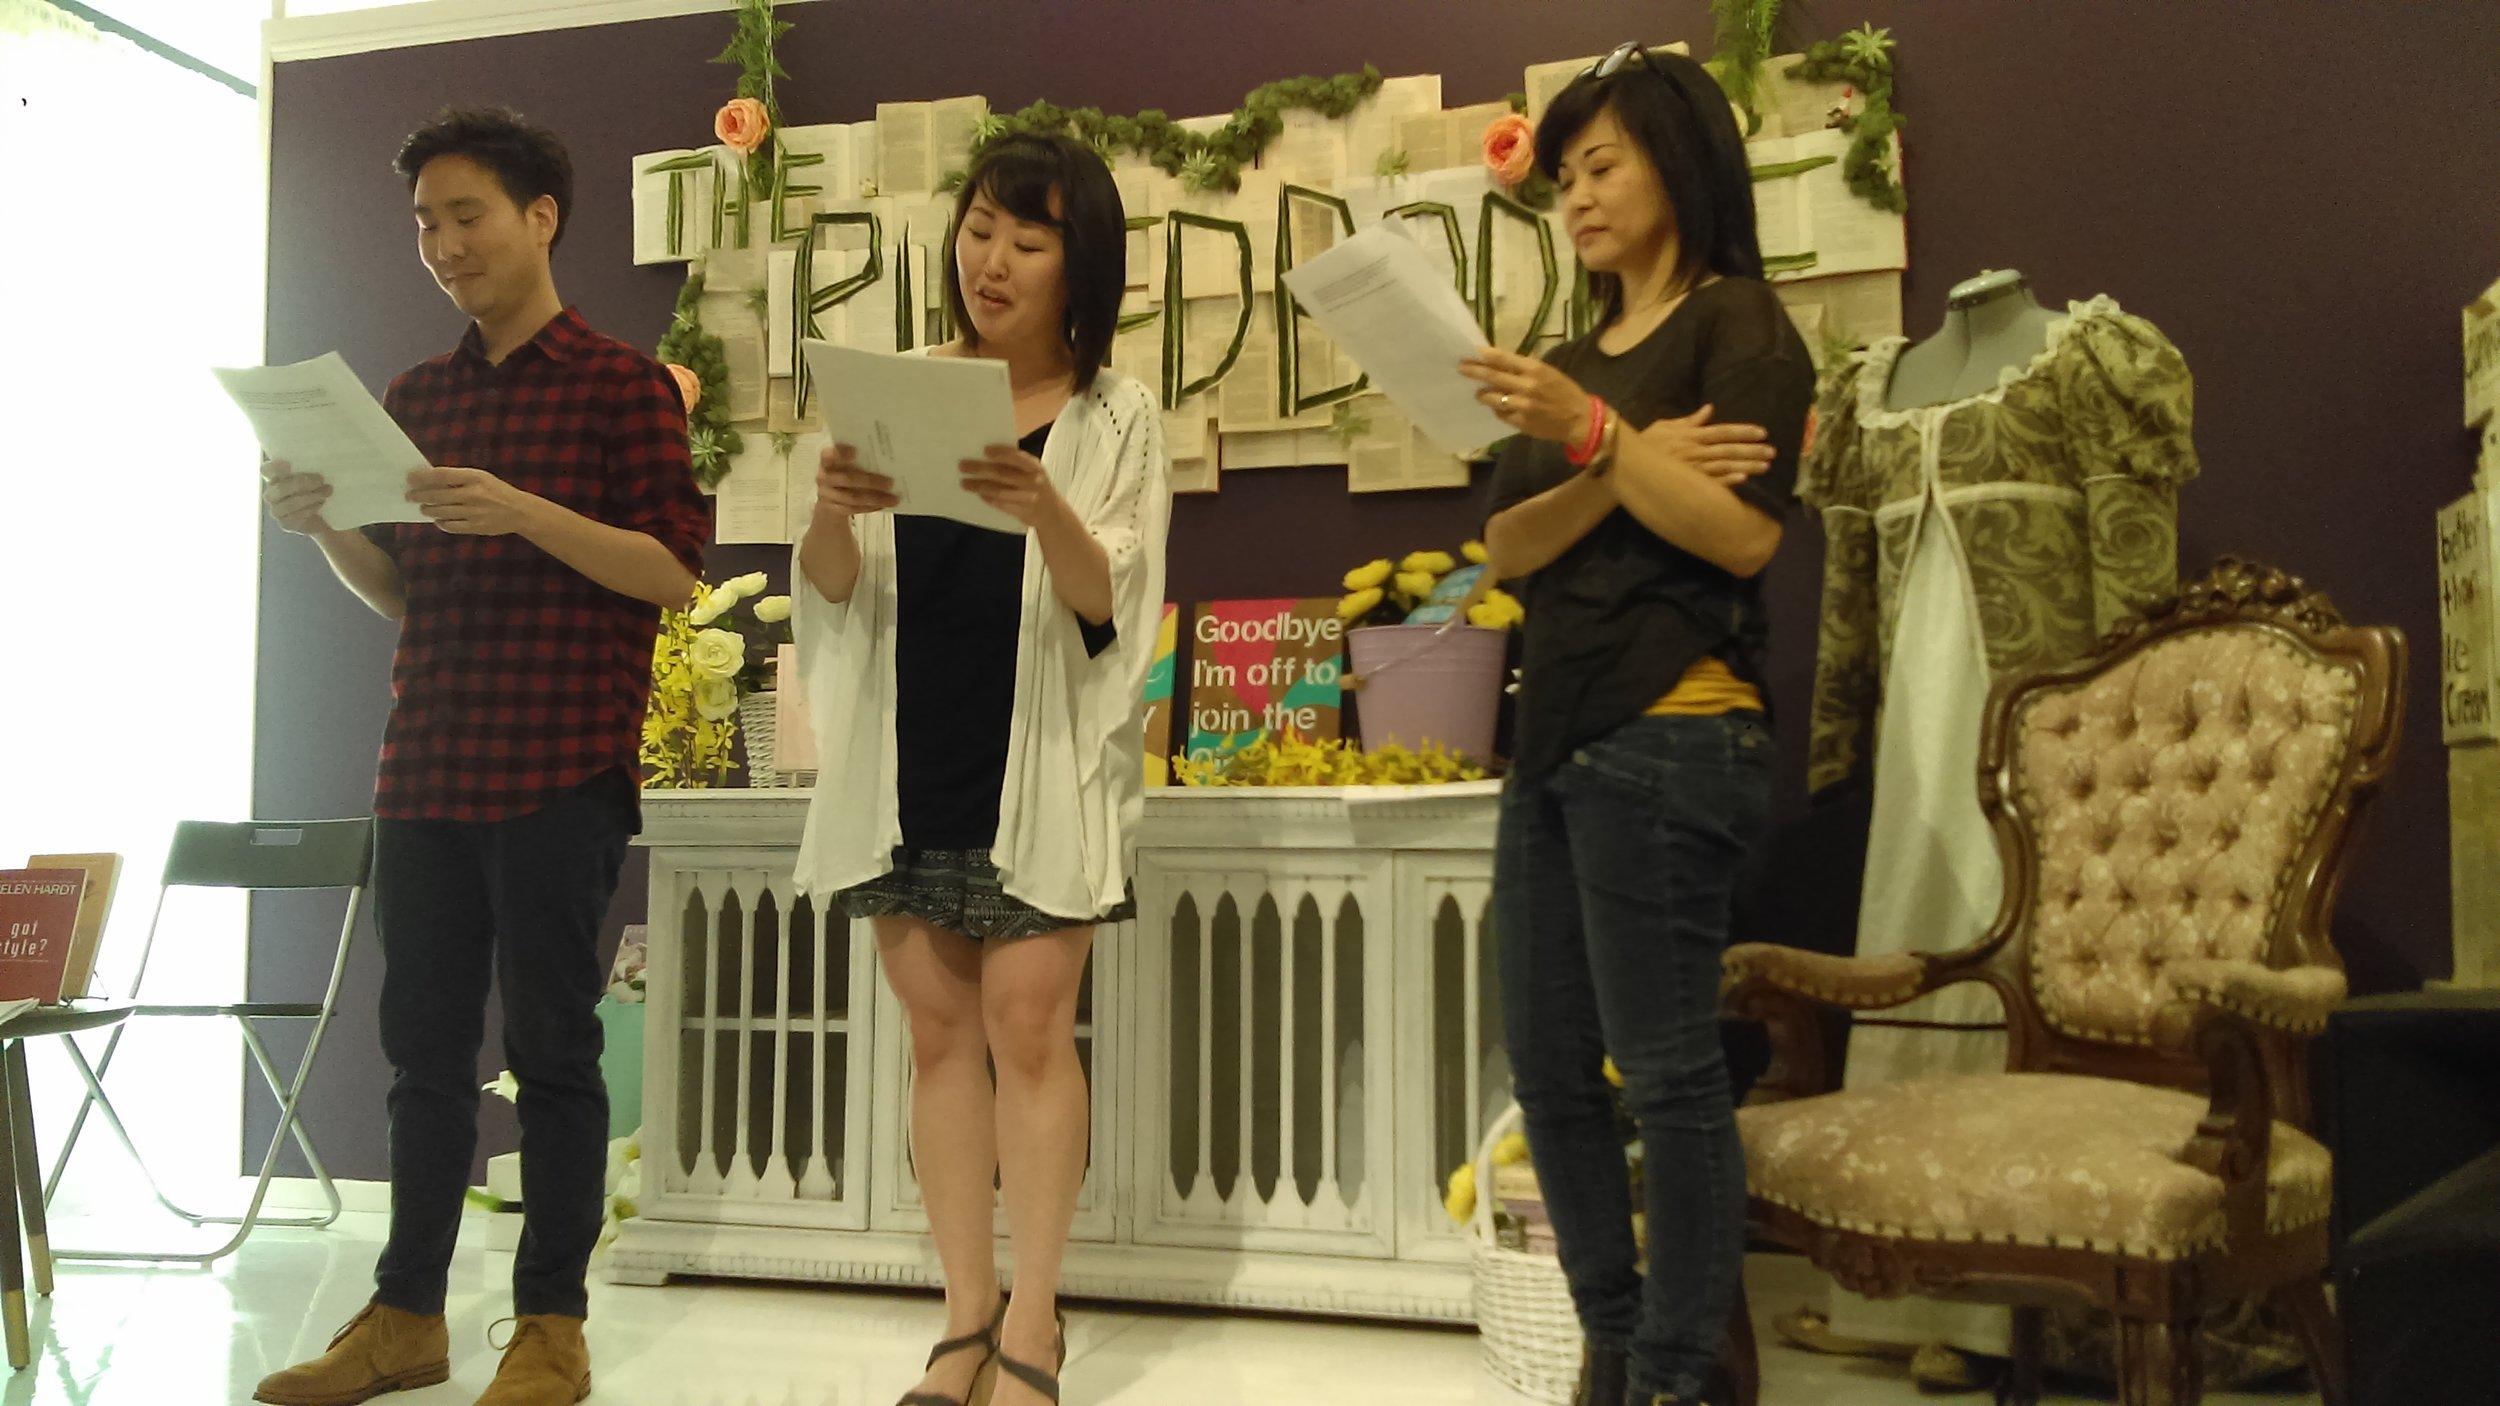 Will Choi (Asian AF, Drunk Monk Podcast, Kdrama Podcast) ; Julia Cho (Asian AF, Lizzie Bennet Diaries), Keiko Agena (Asian AF, Gilmore Girls)